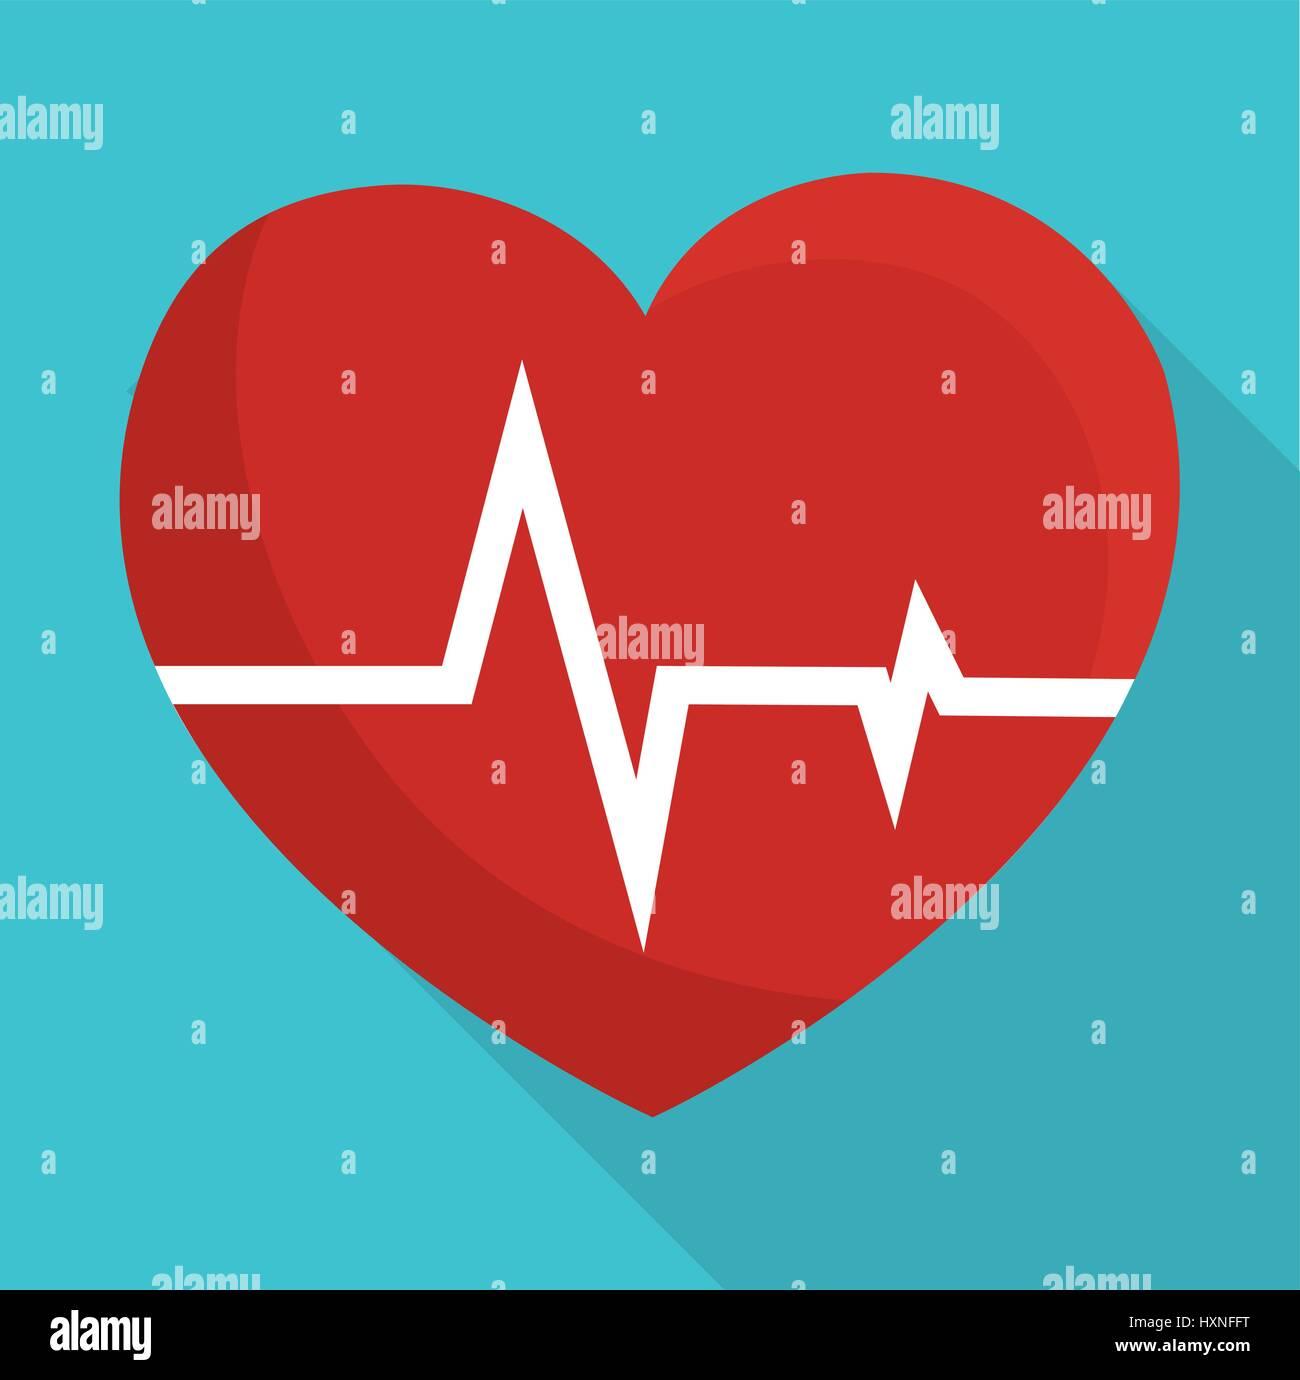 cardio heart icon - Stock Image